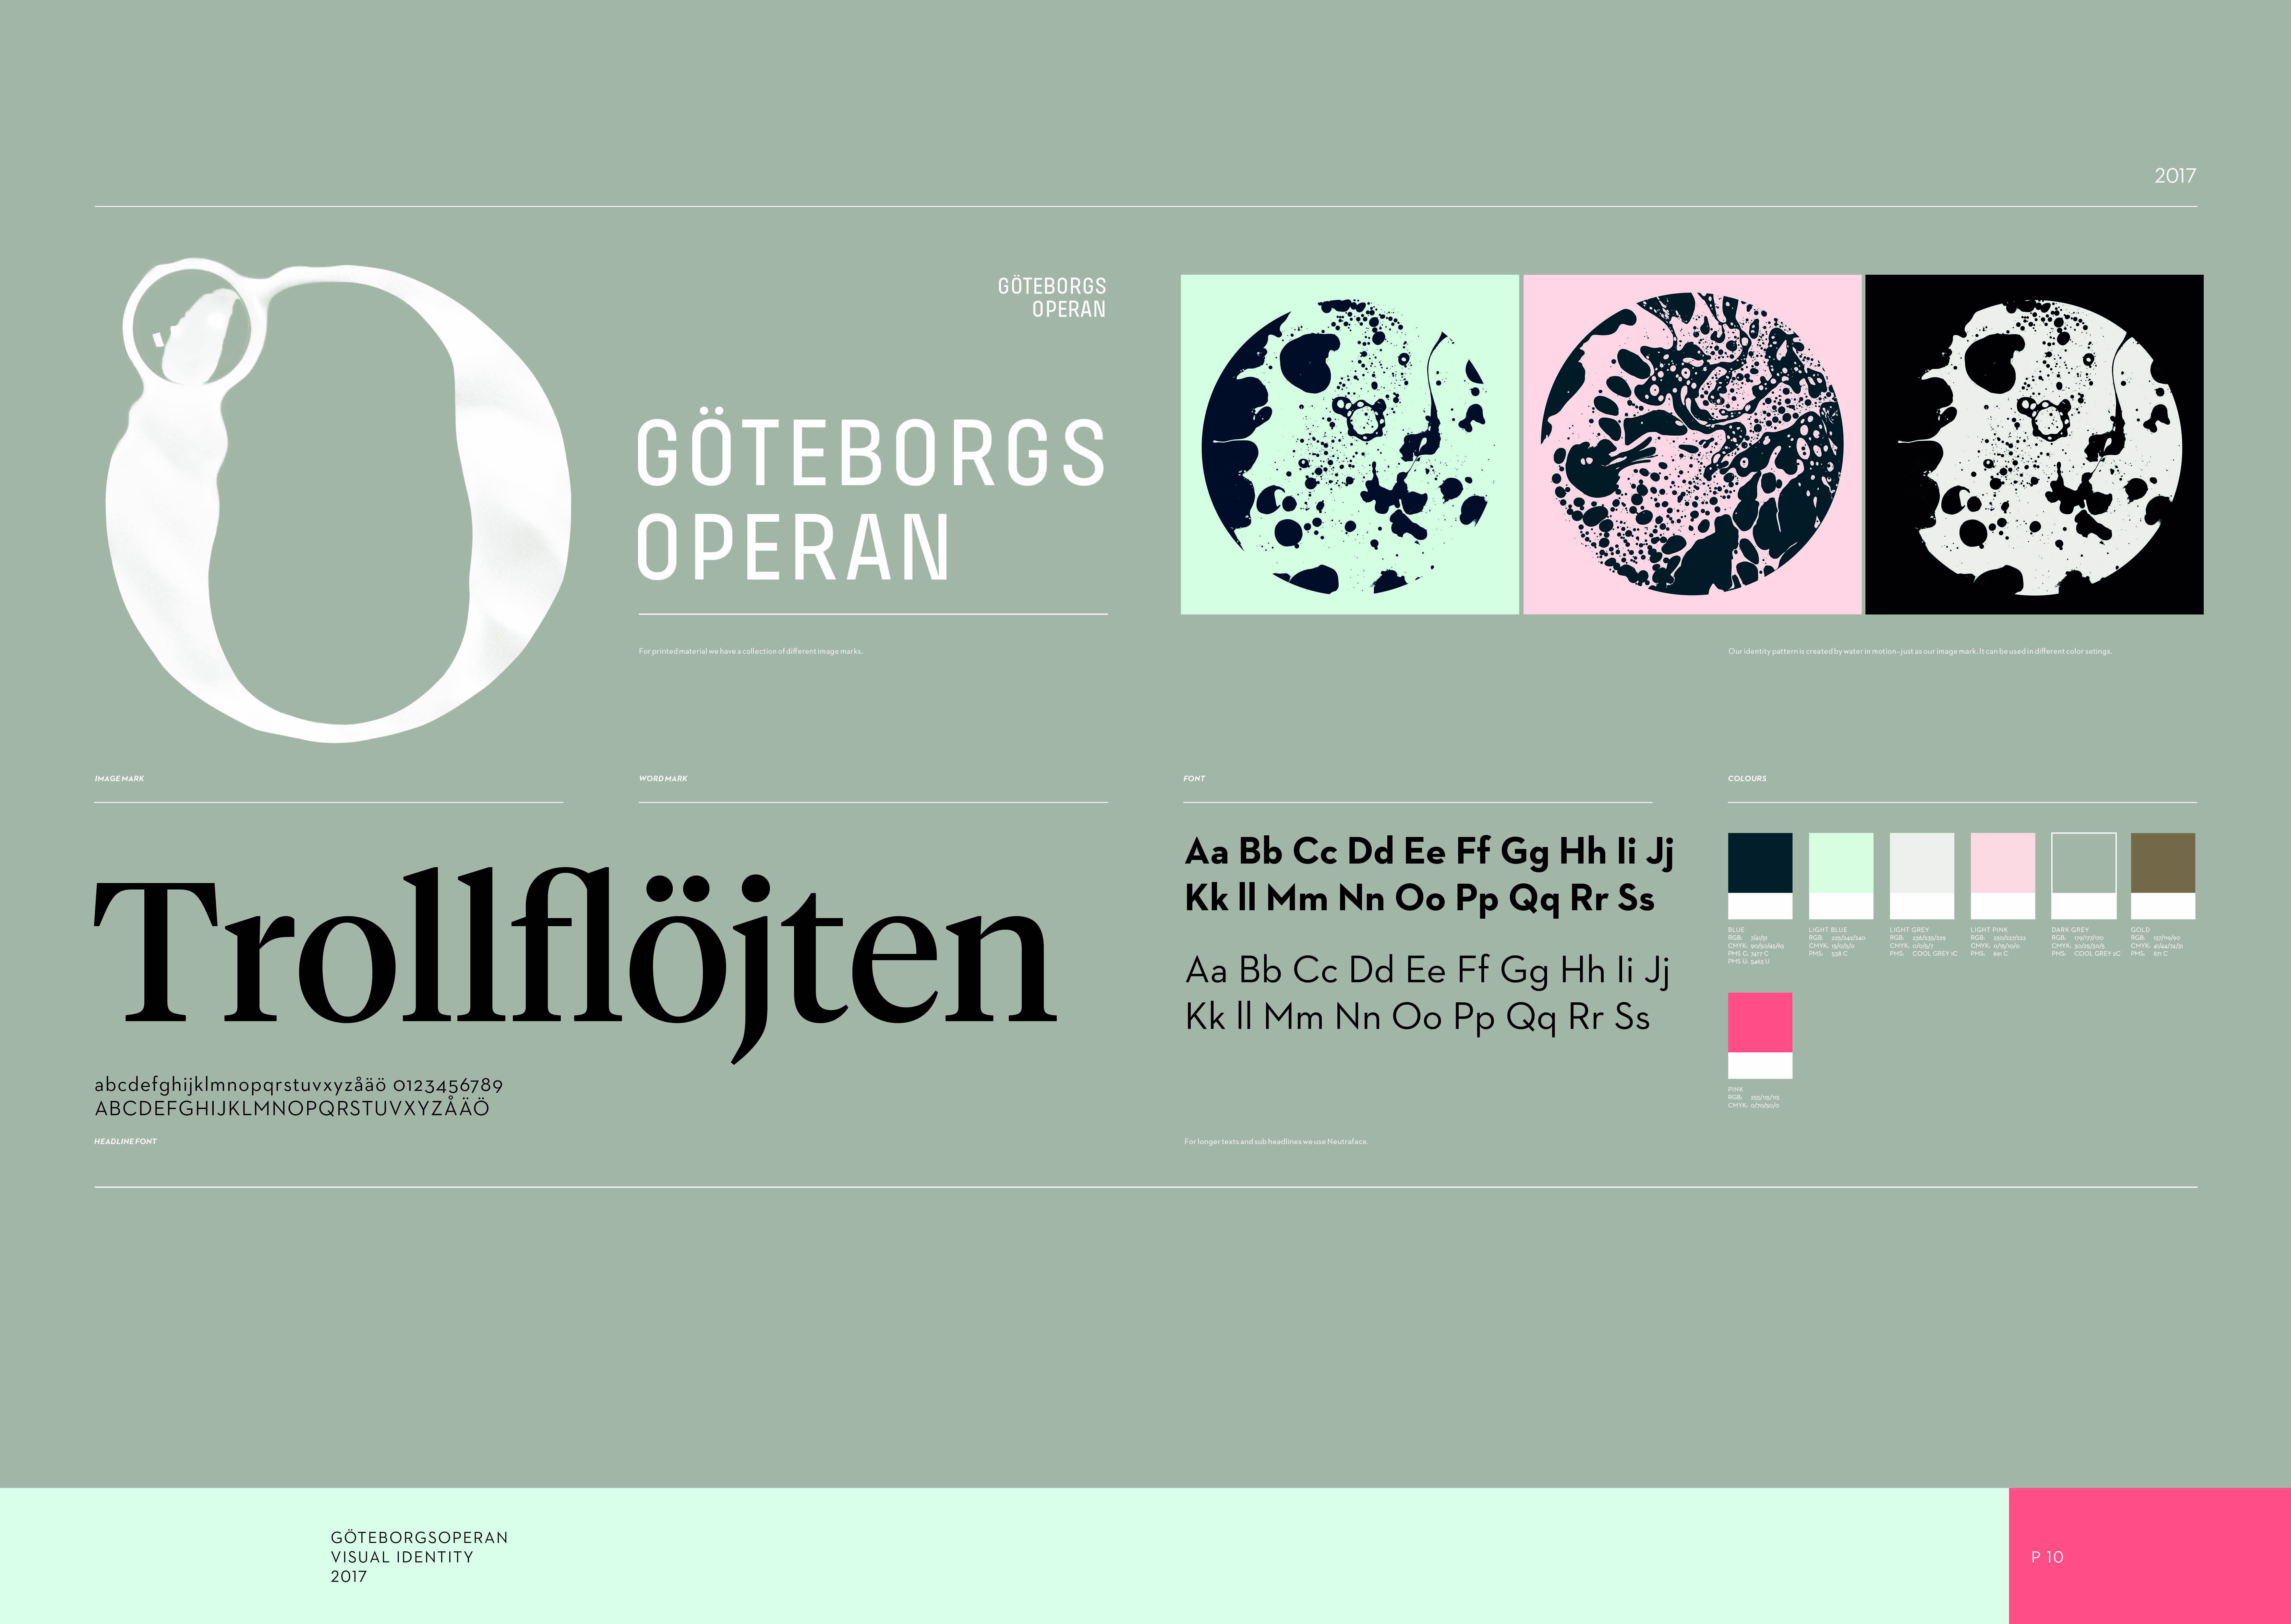 Thumbnail for GöteborgsOperan